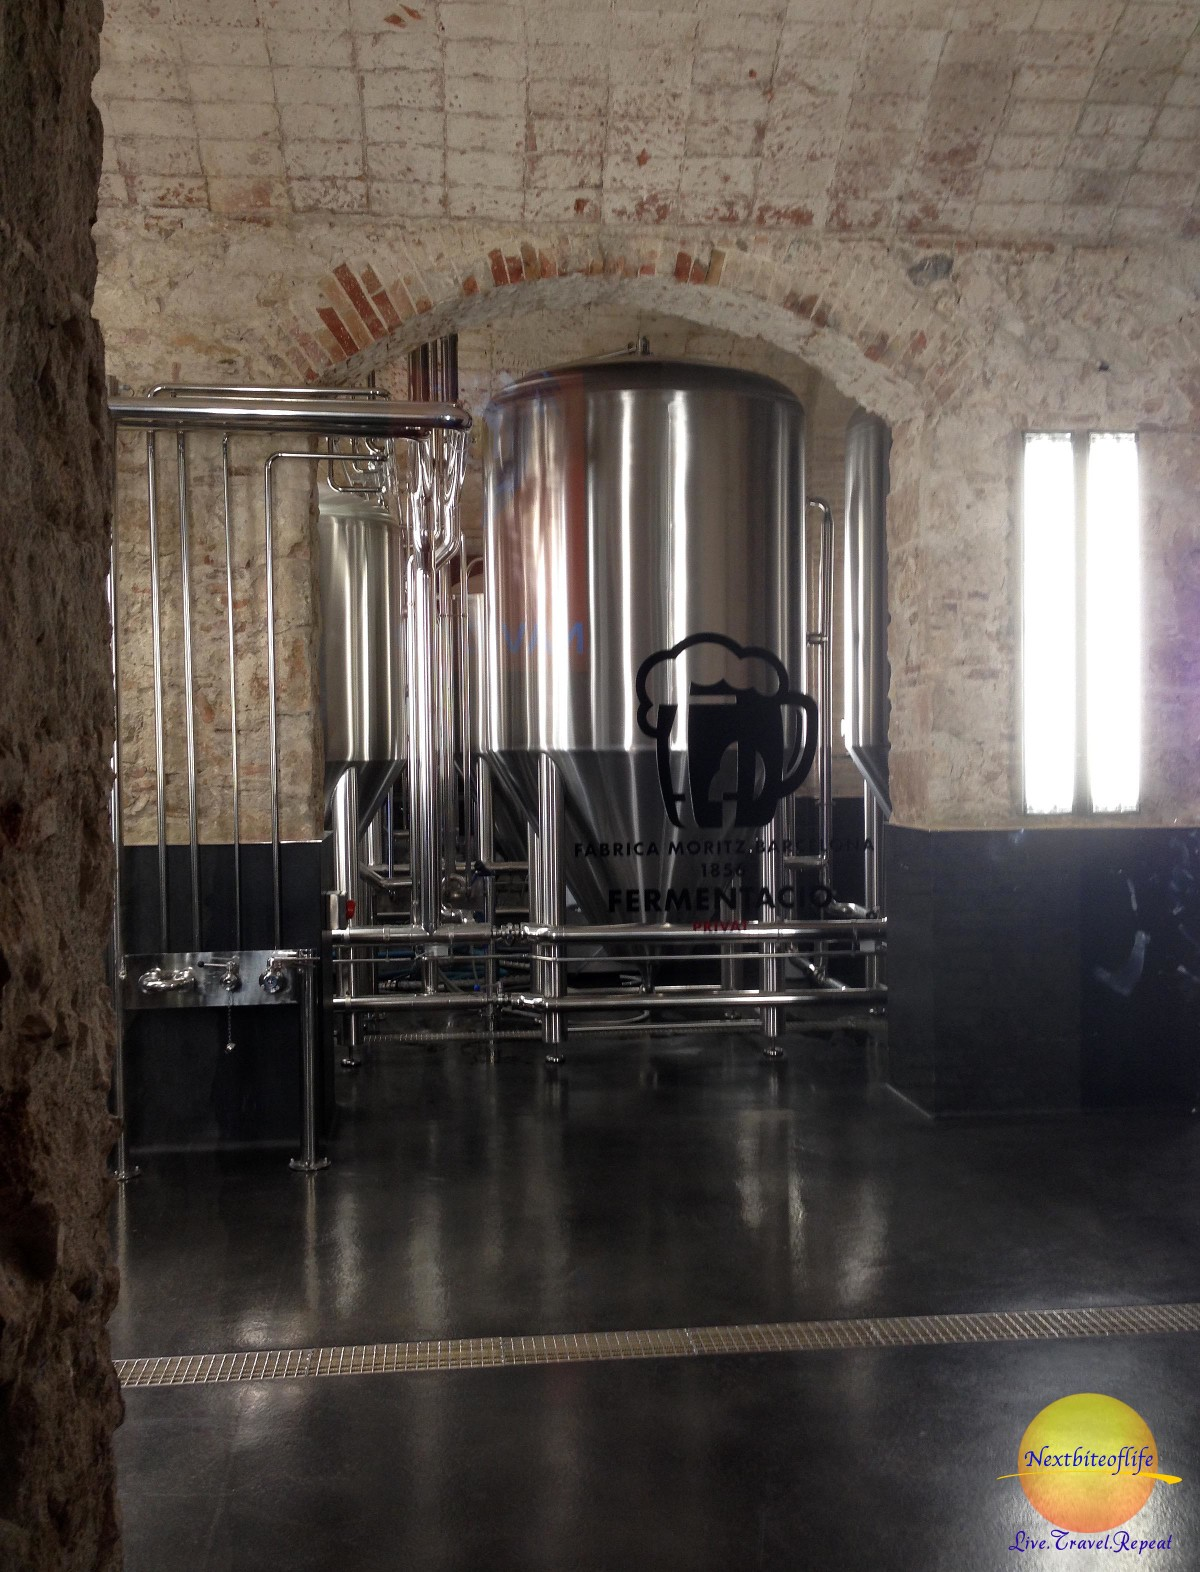 Fabrica Moritz stainless steel tank